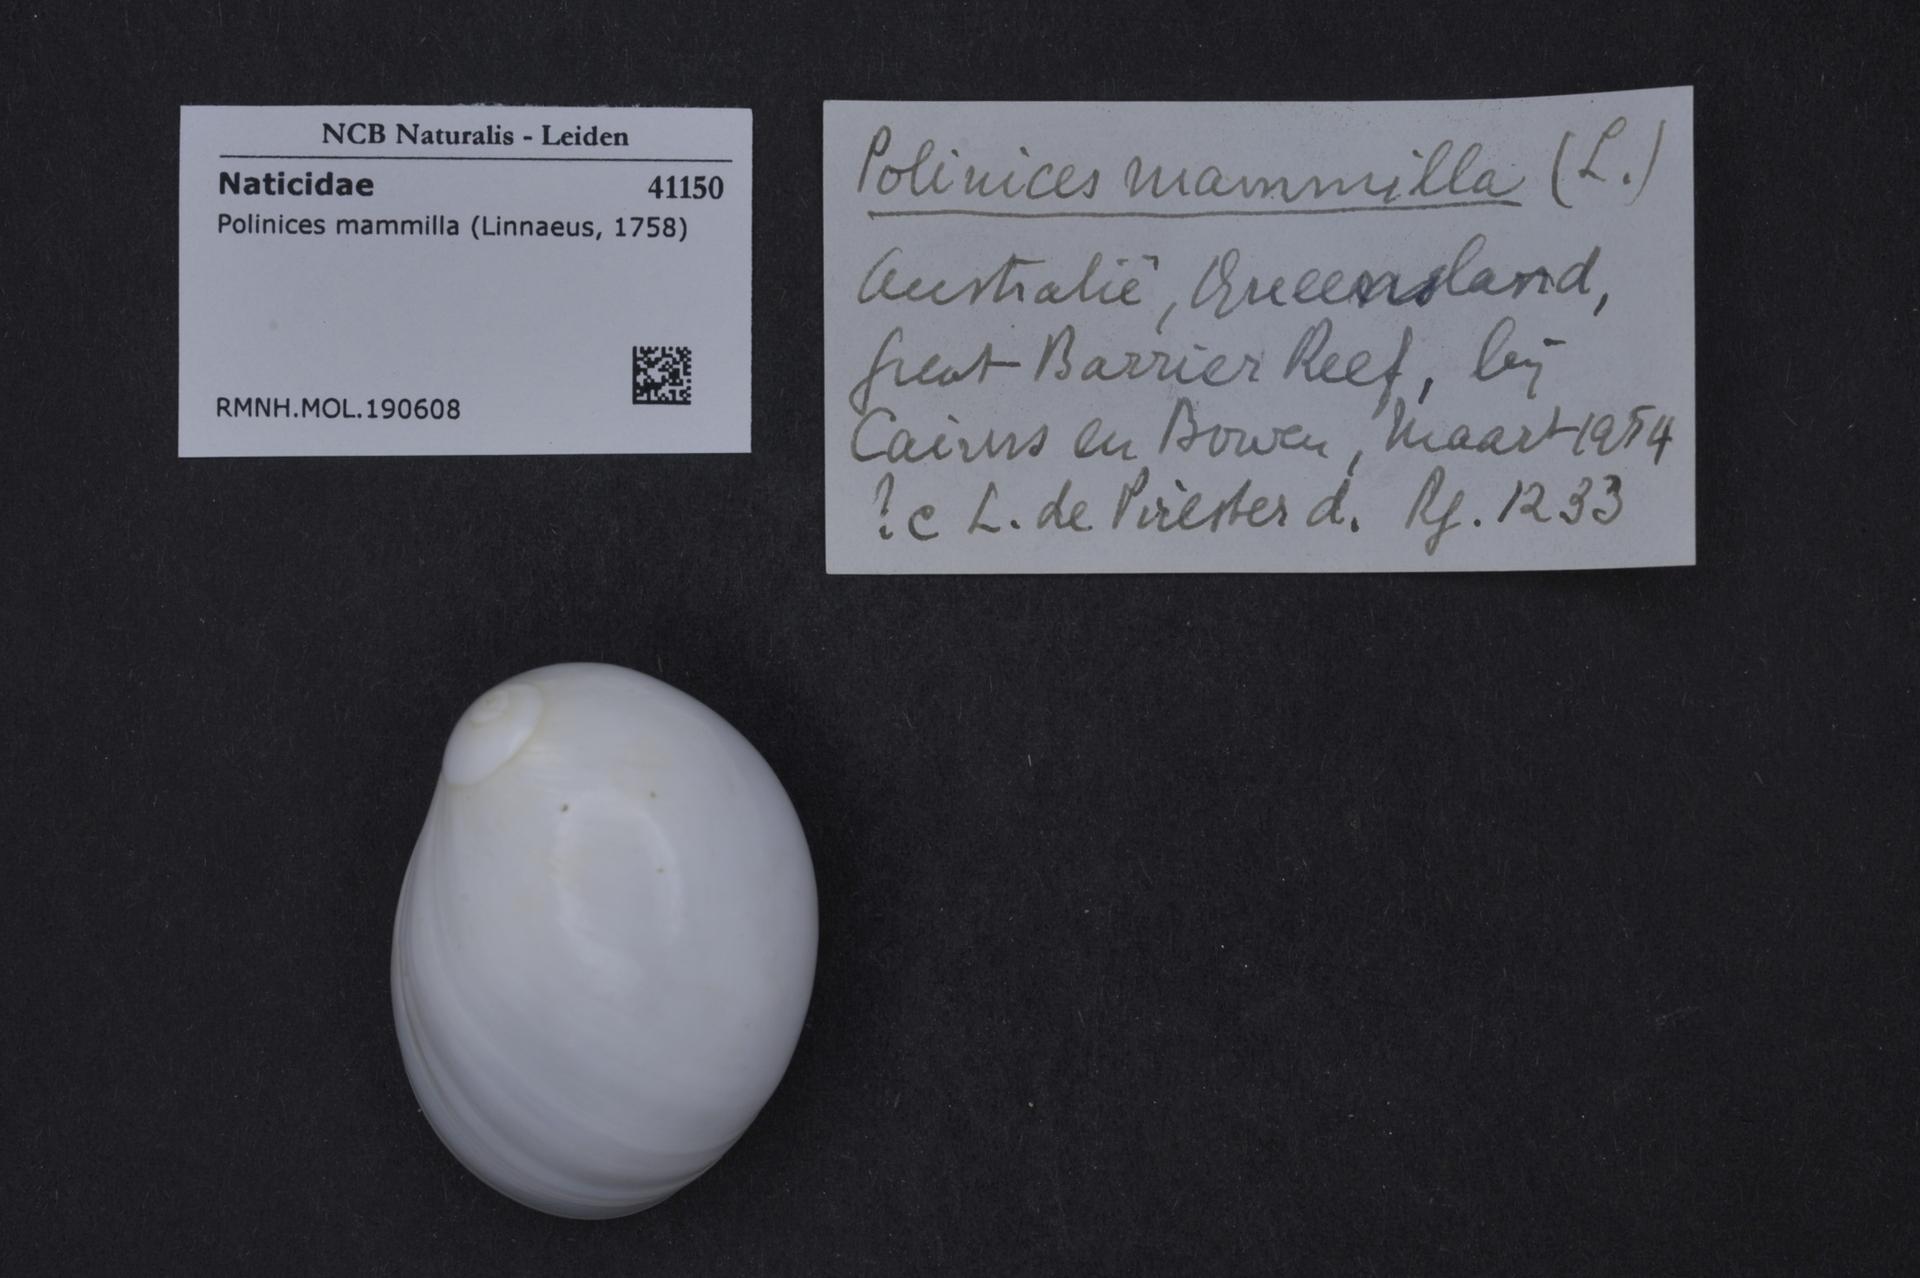 RMNH.MOL.190608 | Polinices mammilla (Linnaeus, 1758)